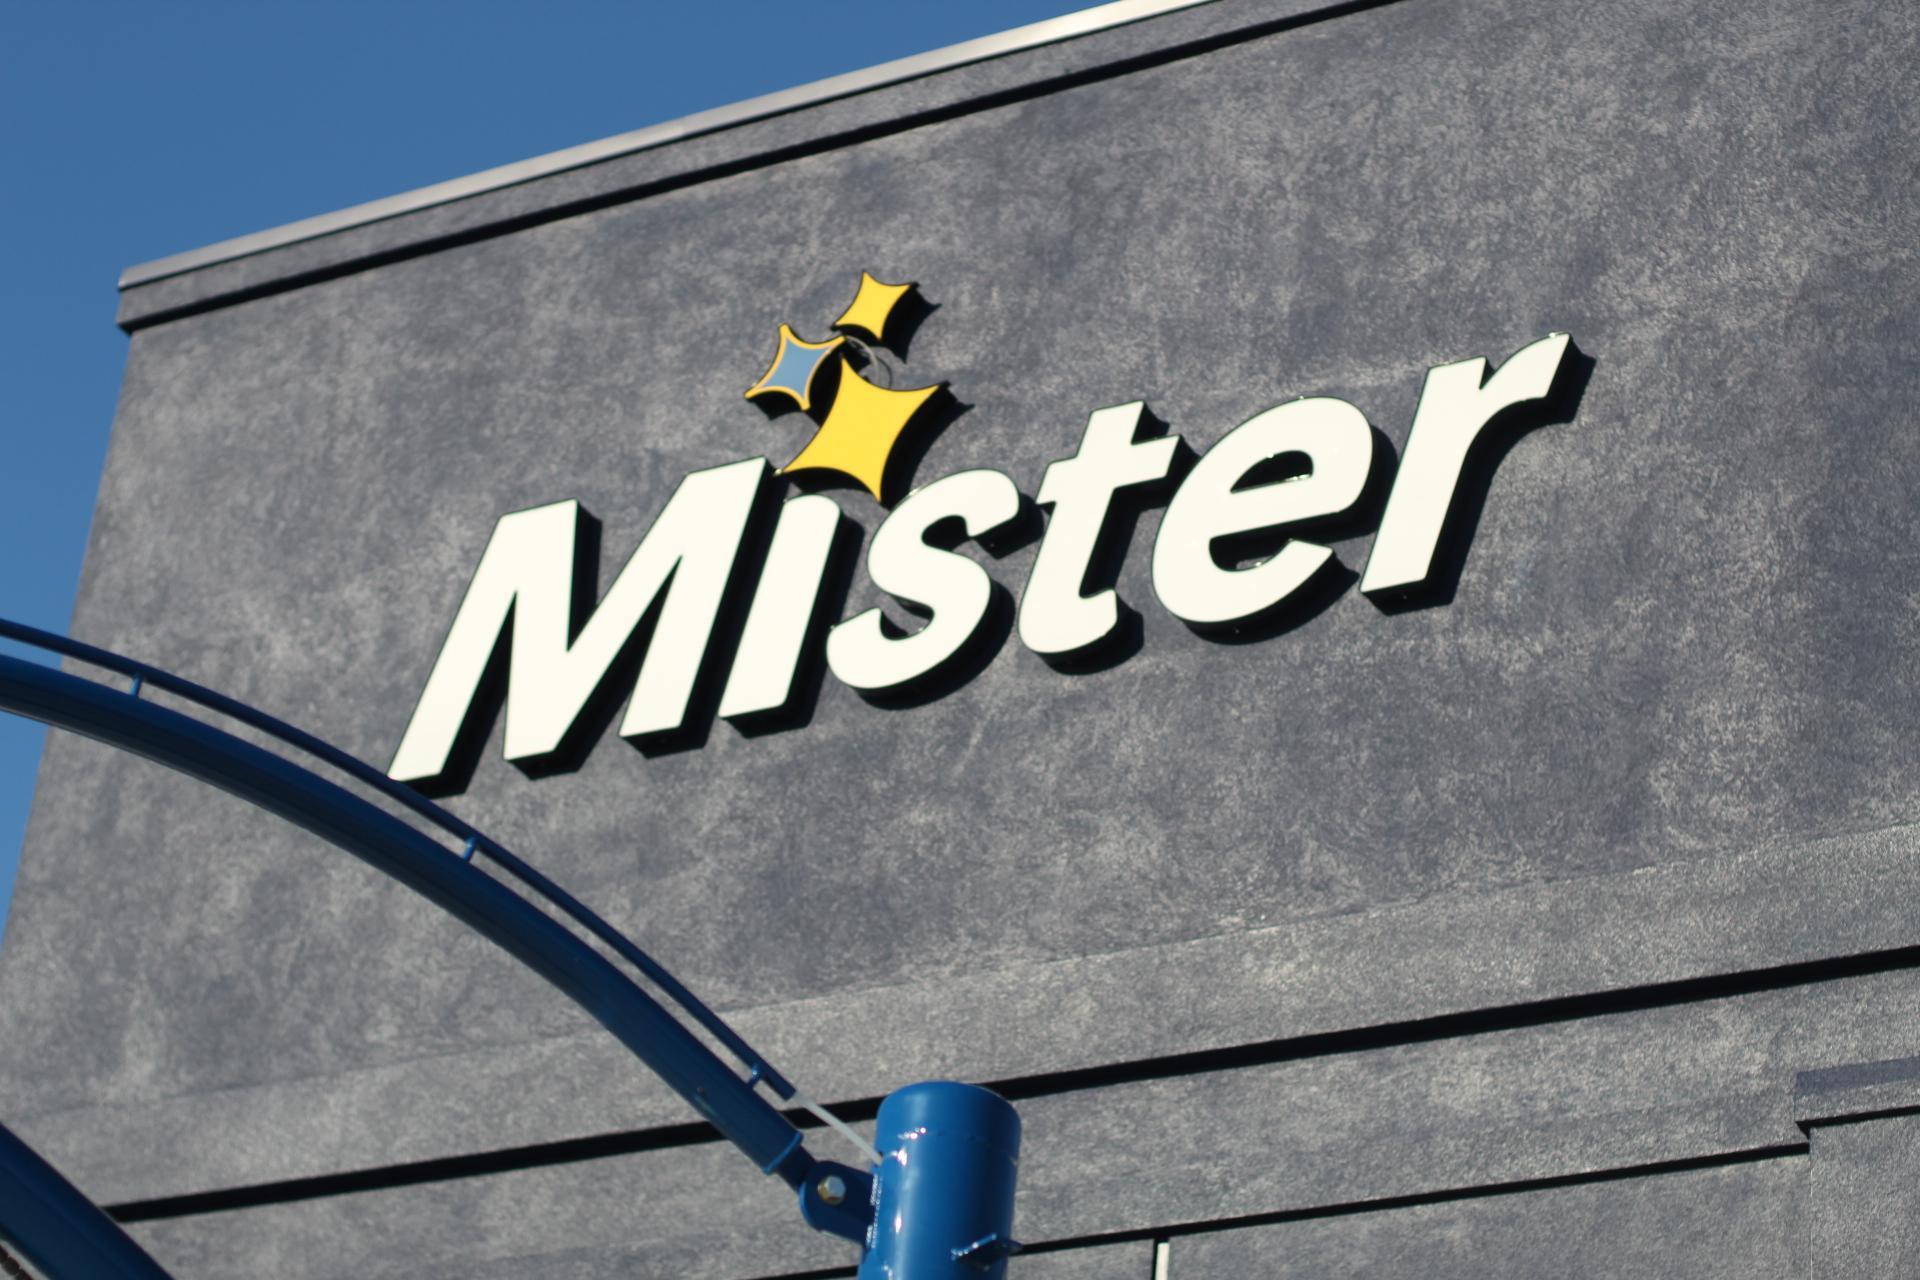 Mister-car-wash-fabulouslyoverdressed